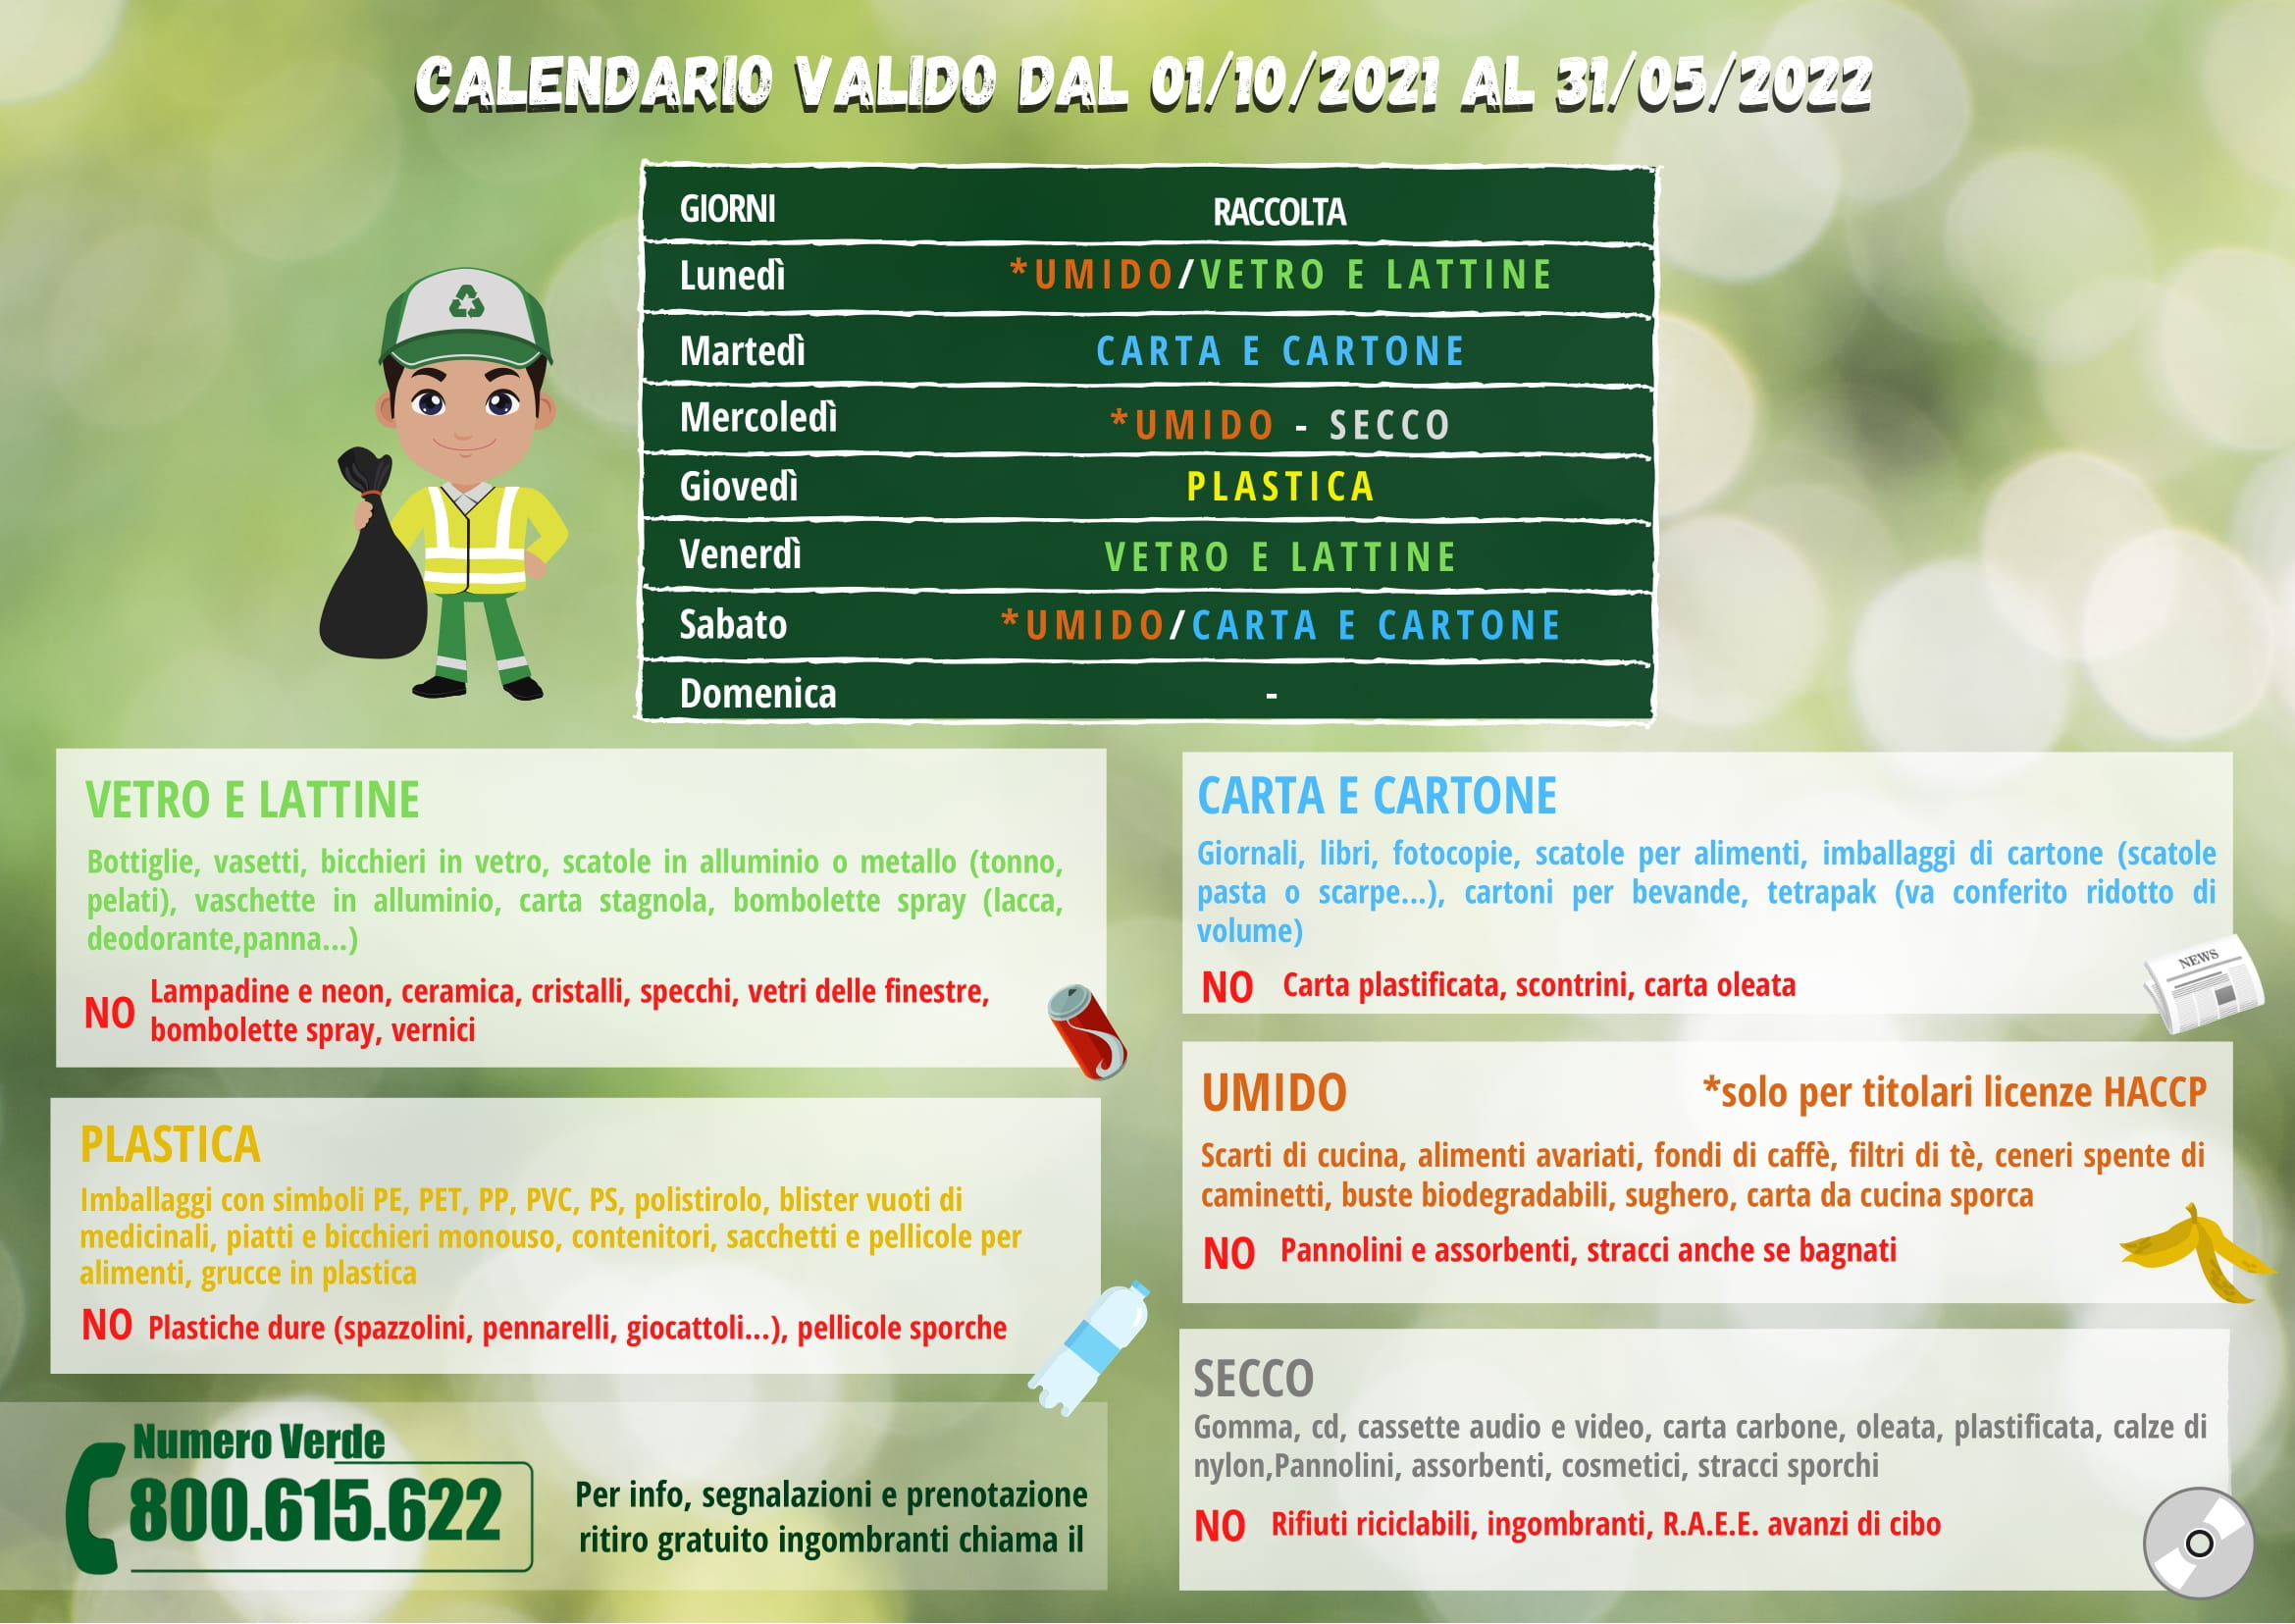 CALENDARIO INVERNALE RACCOLTA UND CARLOFORTE 2021-2022-2